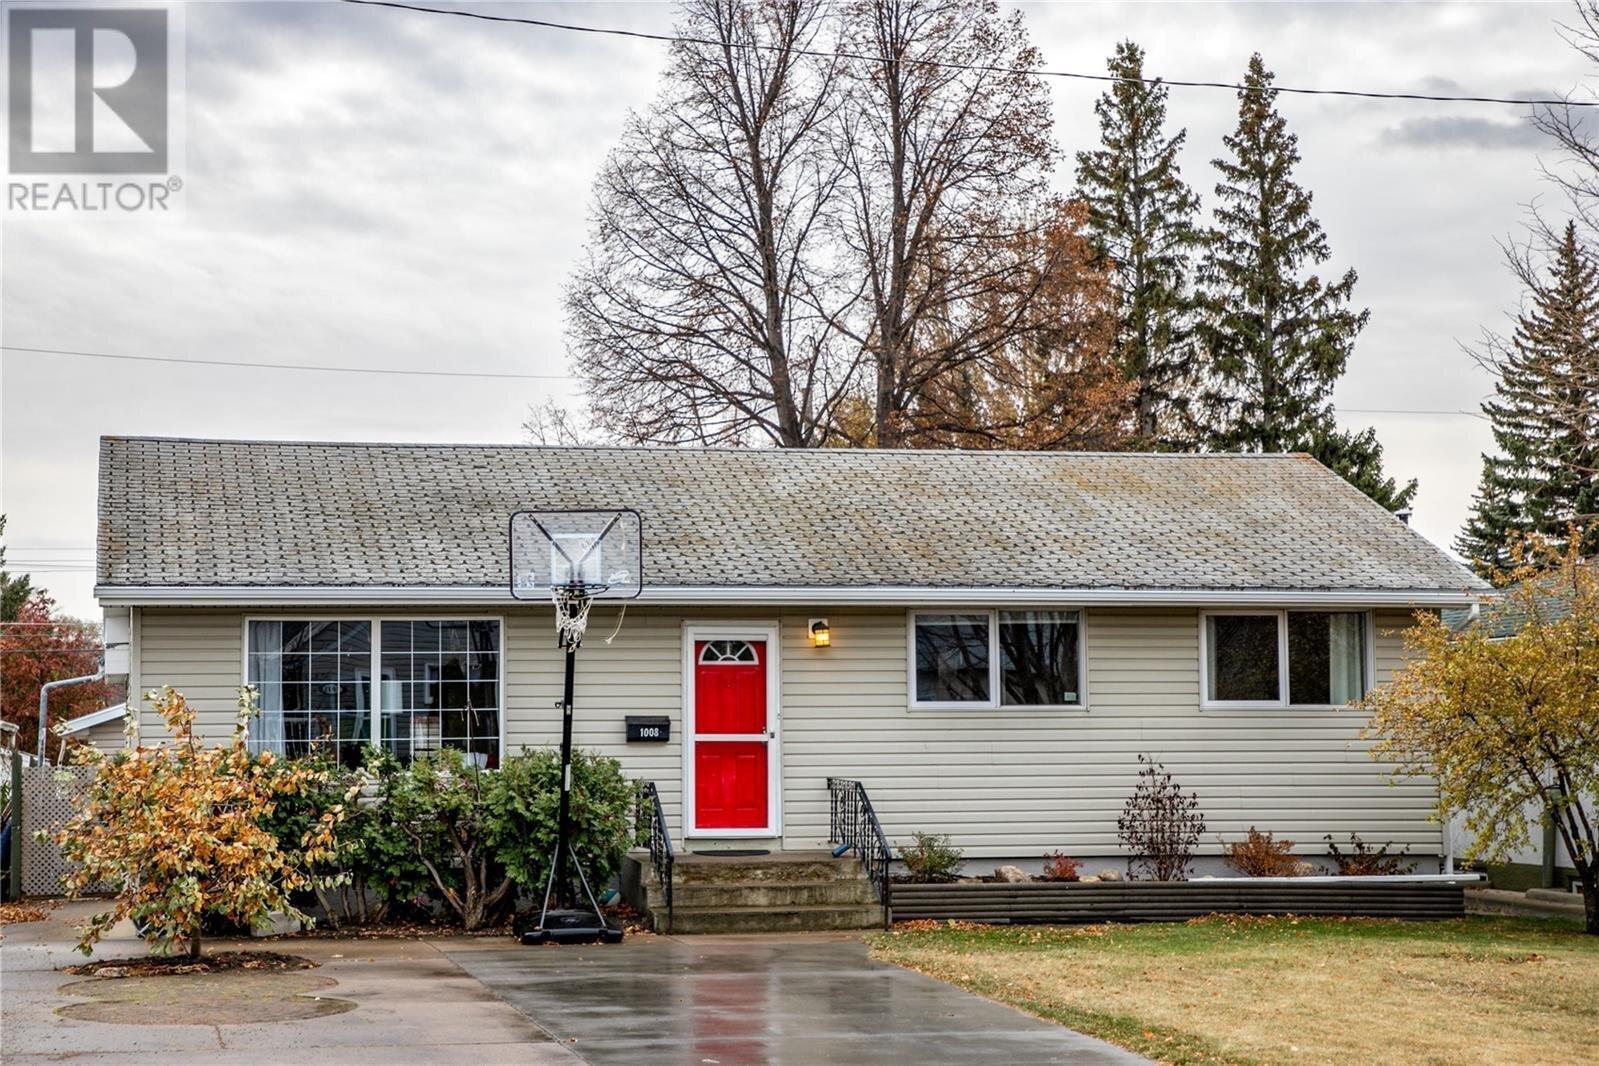 House for sale at 1008 1st St E Saskatoon Saskatchewan - MLS: SK831435